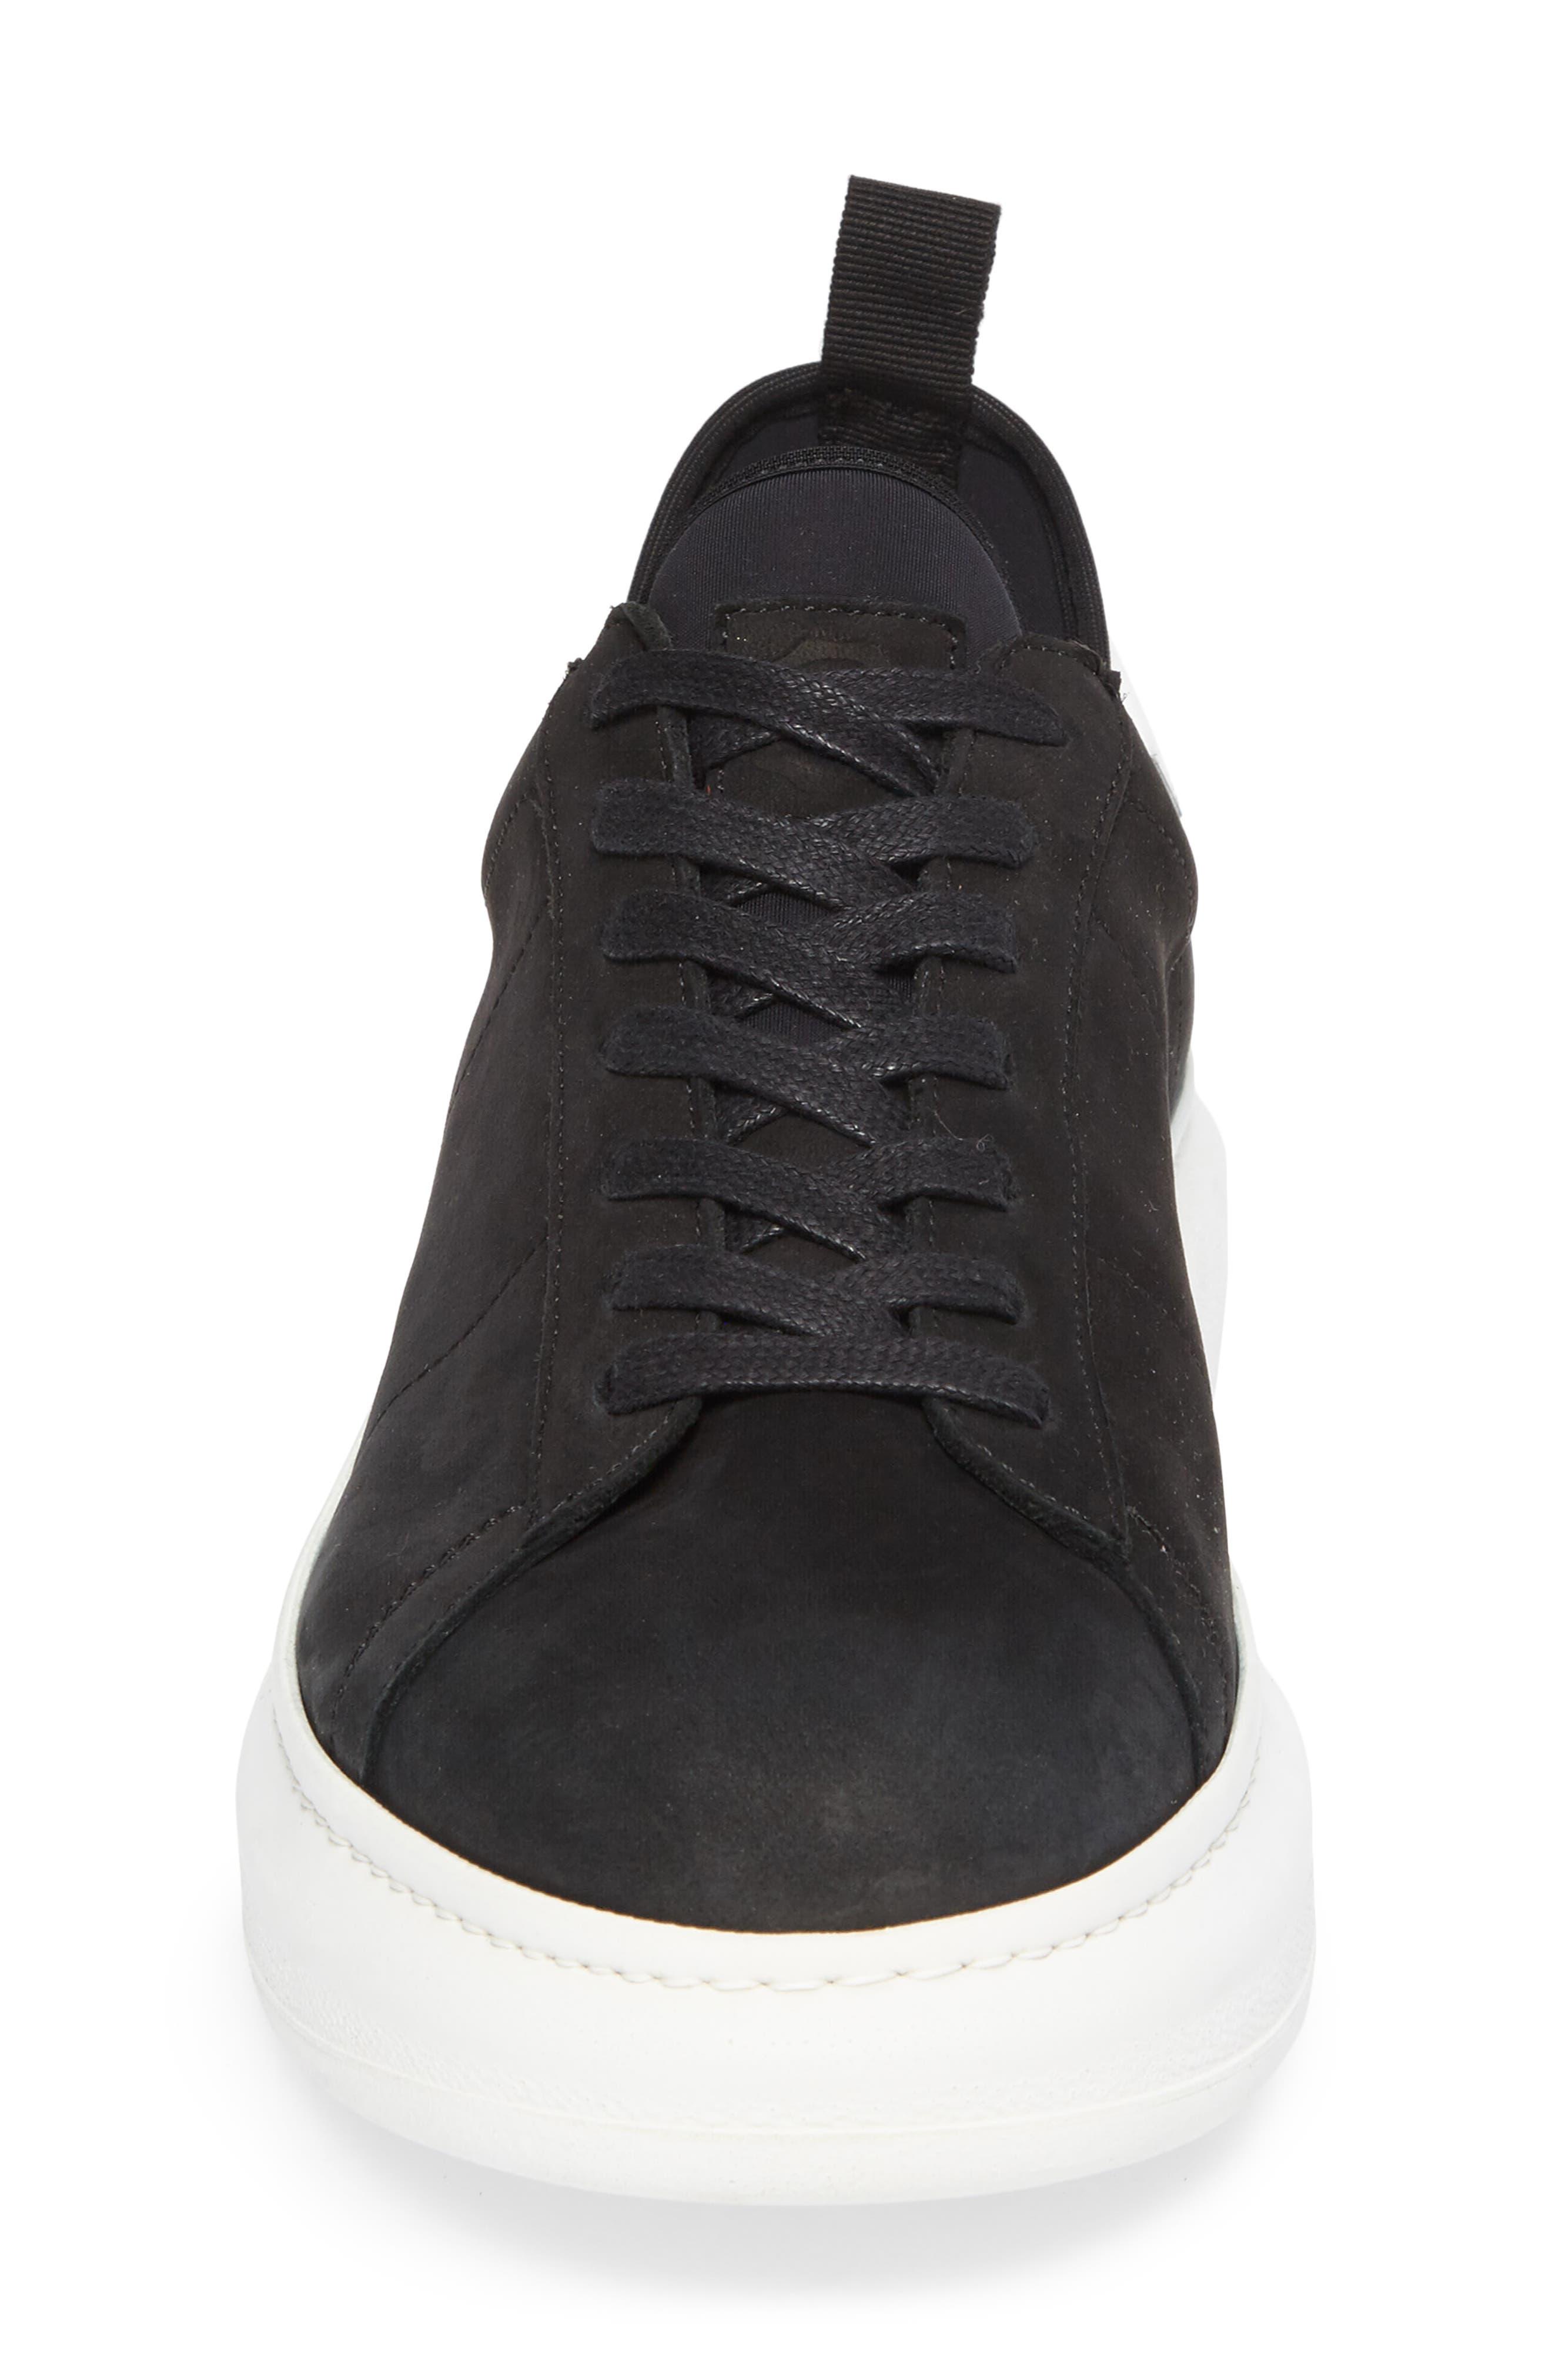 Alta Low Top Sneaker,                             Alternate thumbnail 4, color,                             BLACK NUBUCK LEATHER